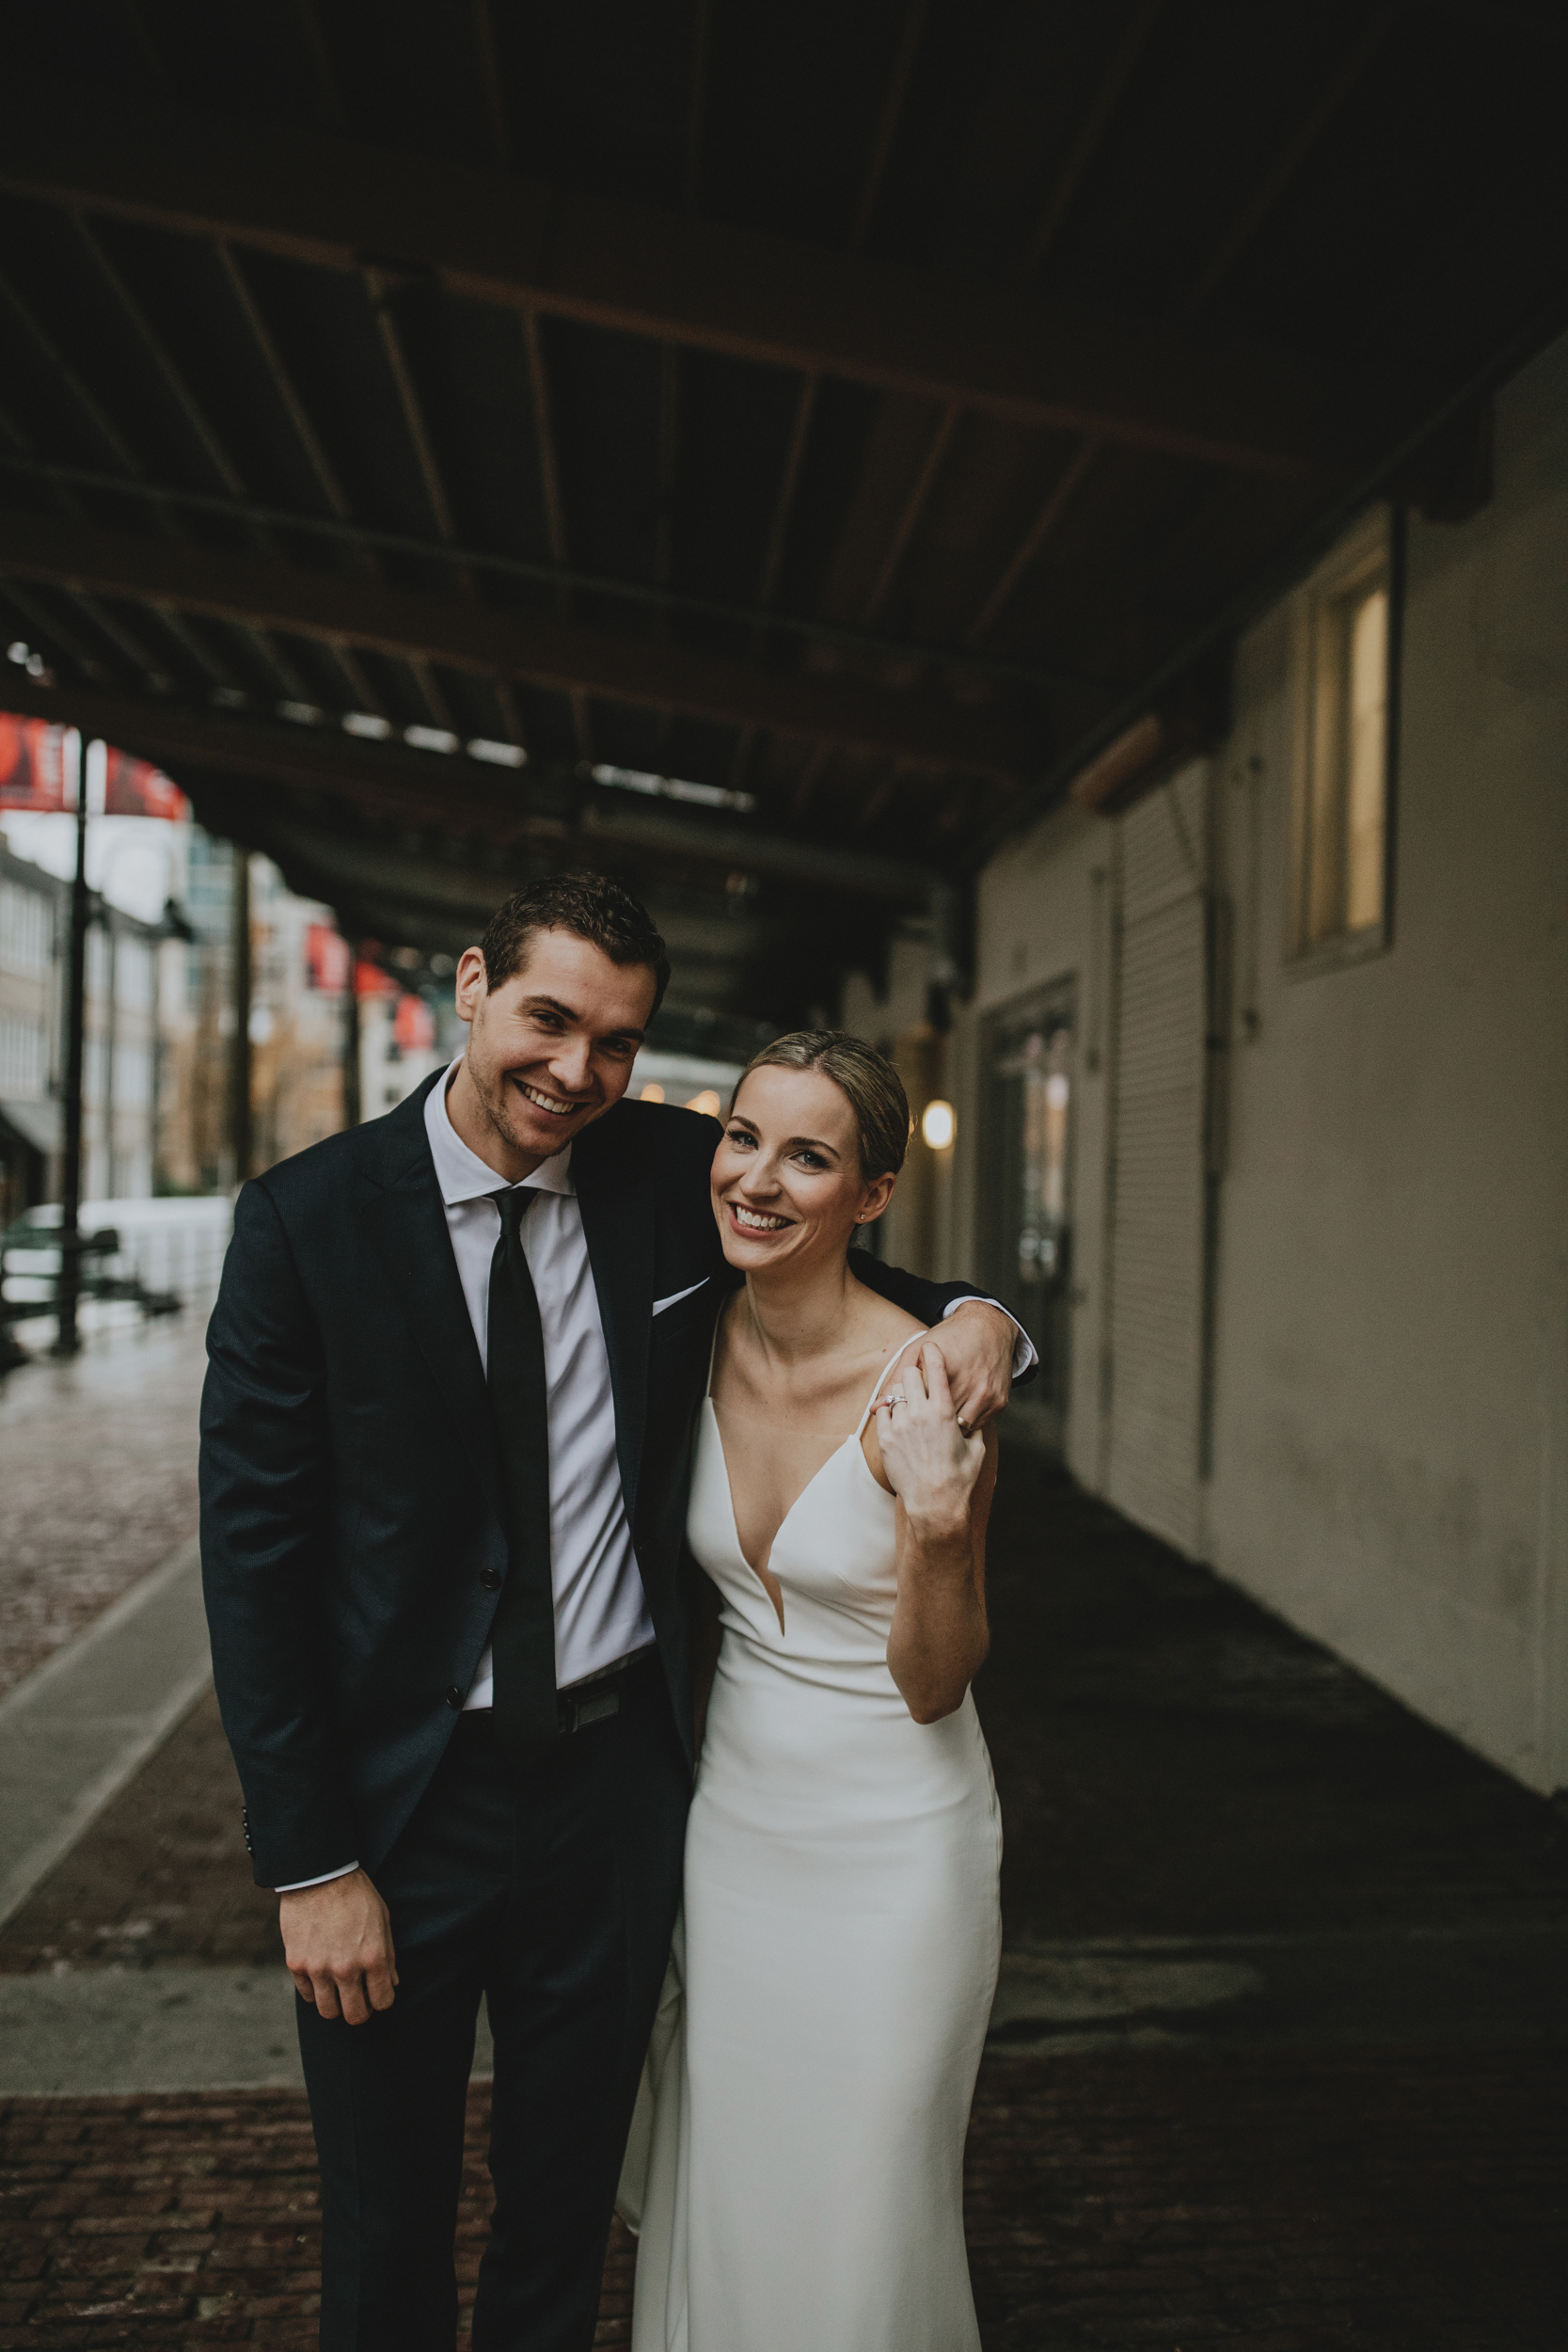 Earls-Loft-City-Vancouver-Wedding-15.jpg